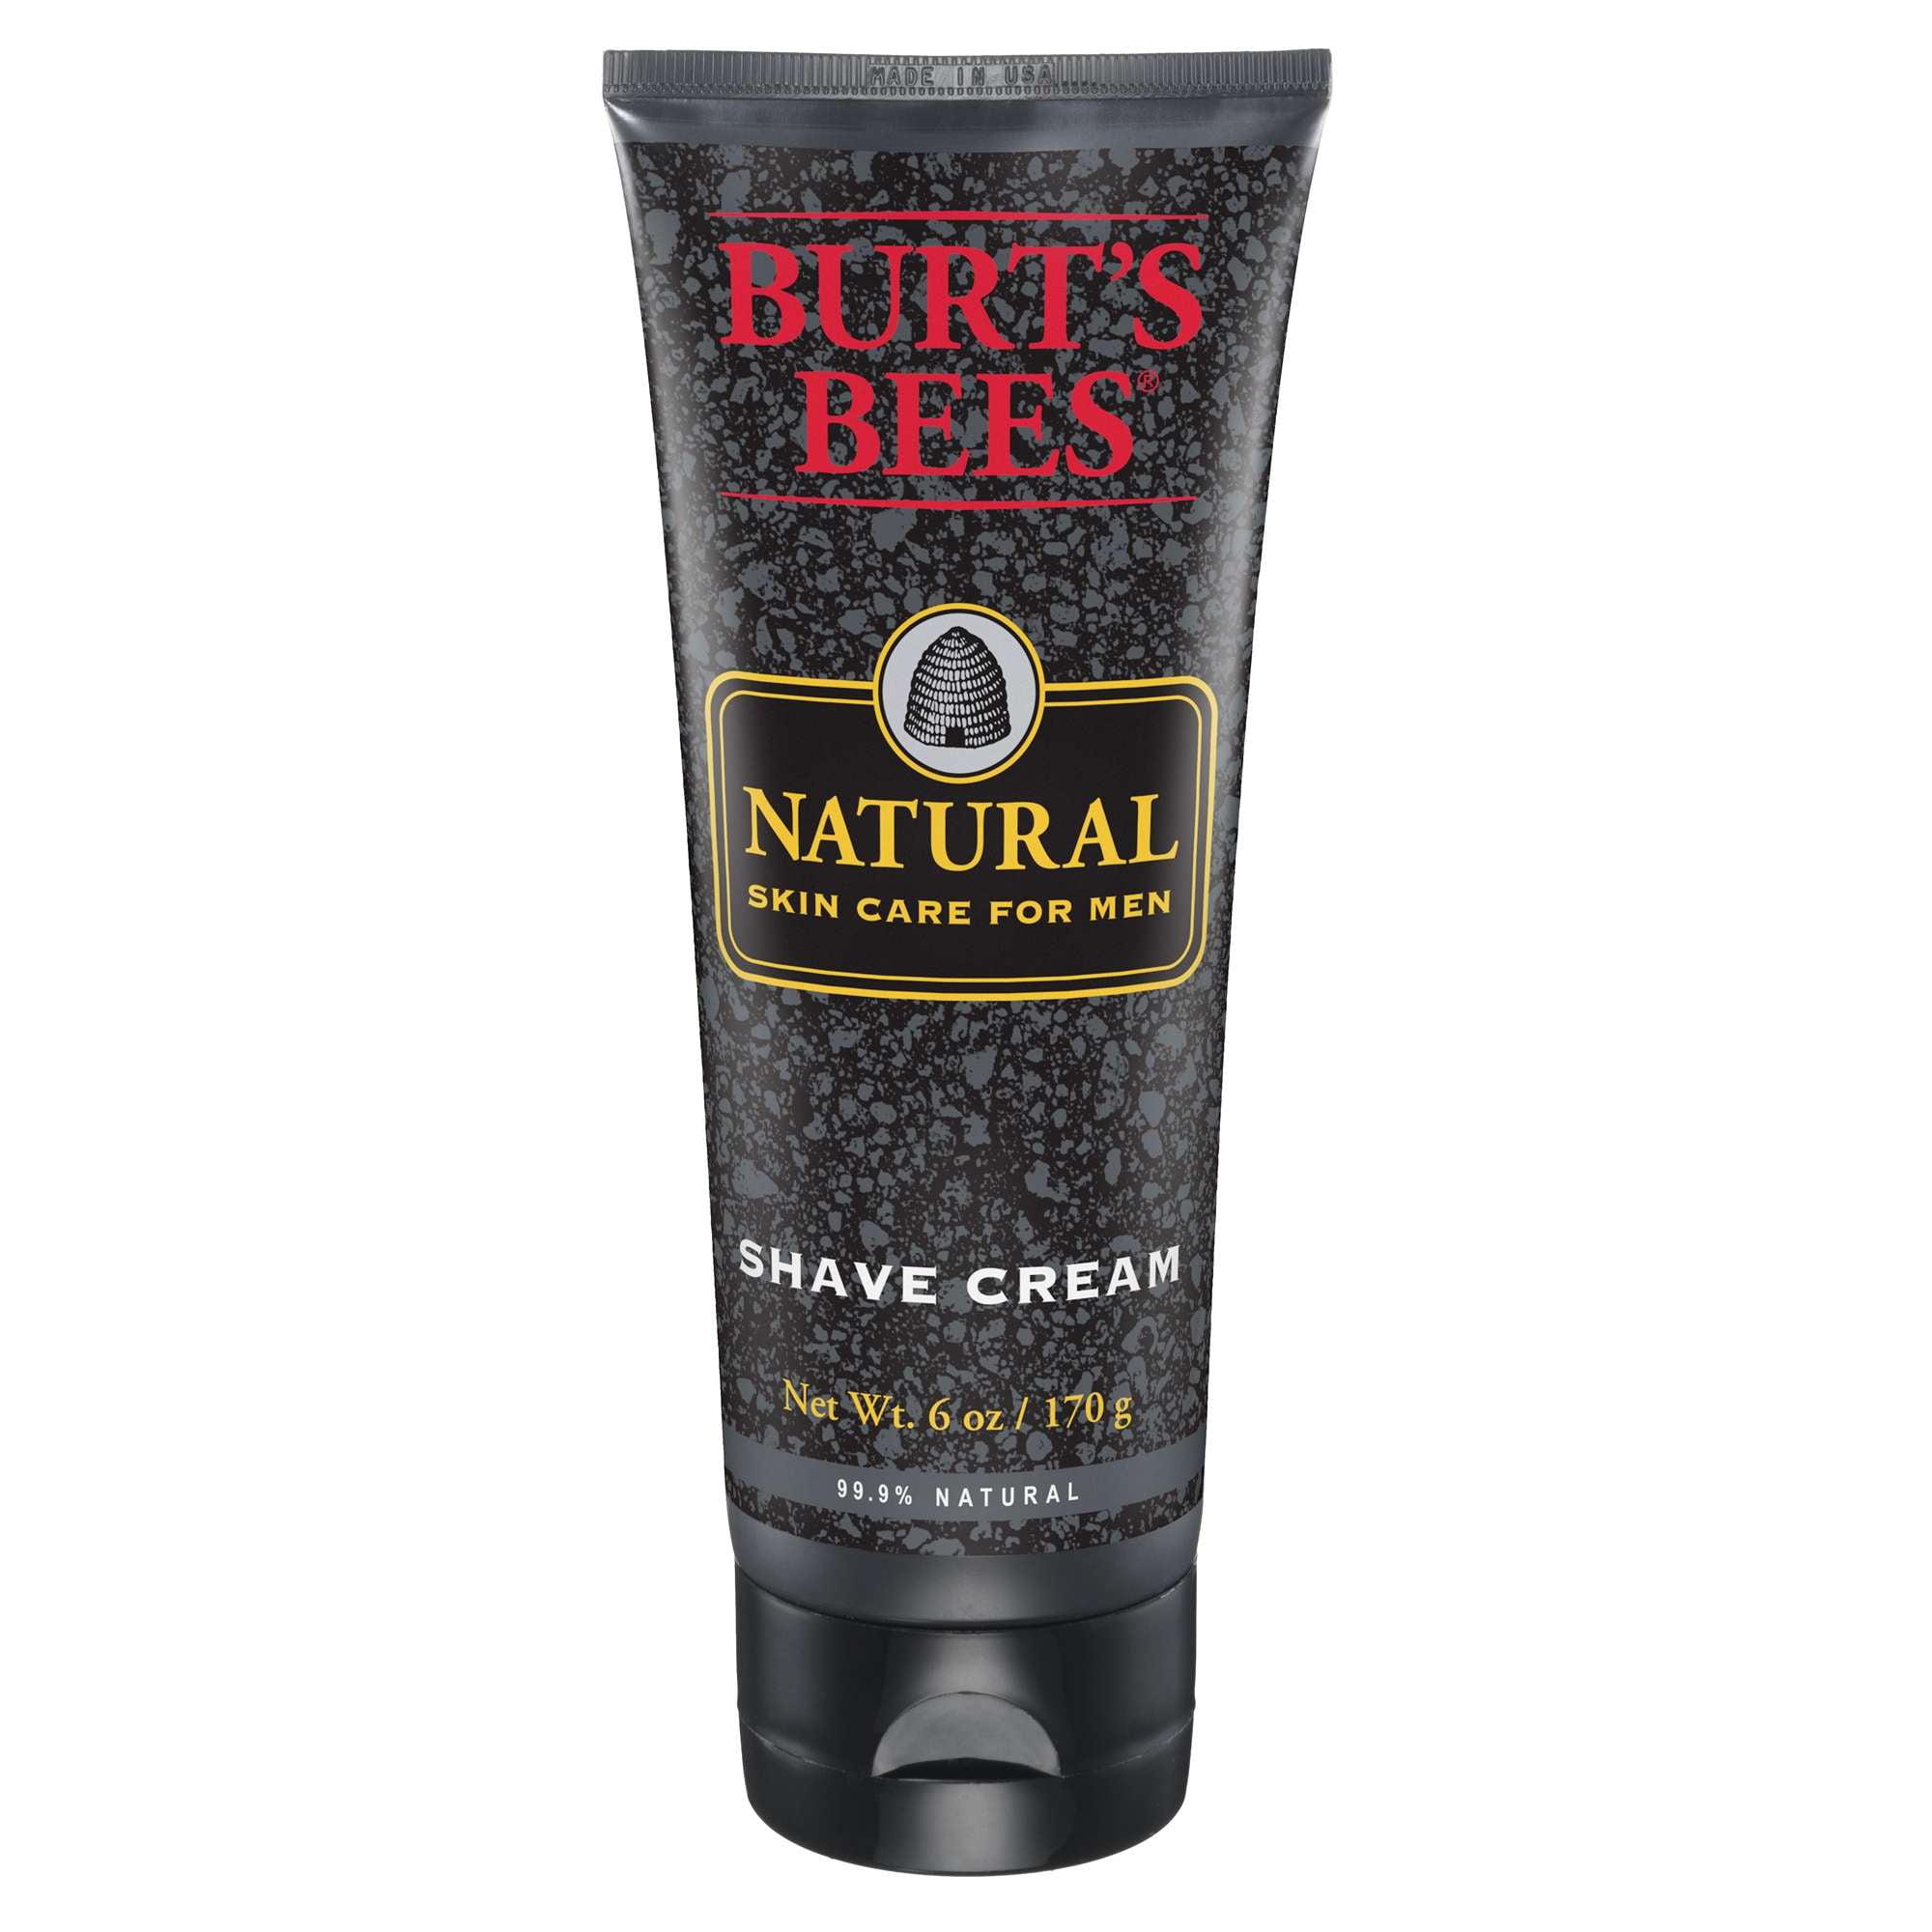 Burt's Bees Natural Skin Care for Men Shave Cream, 6 oz